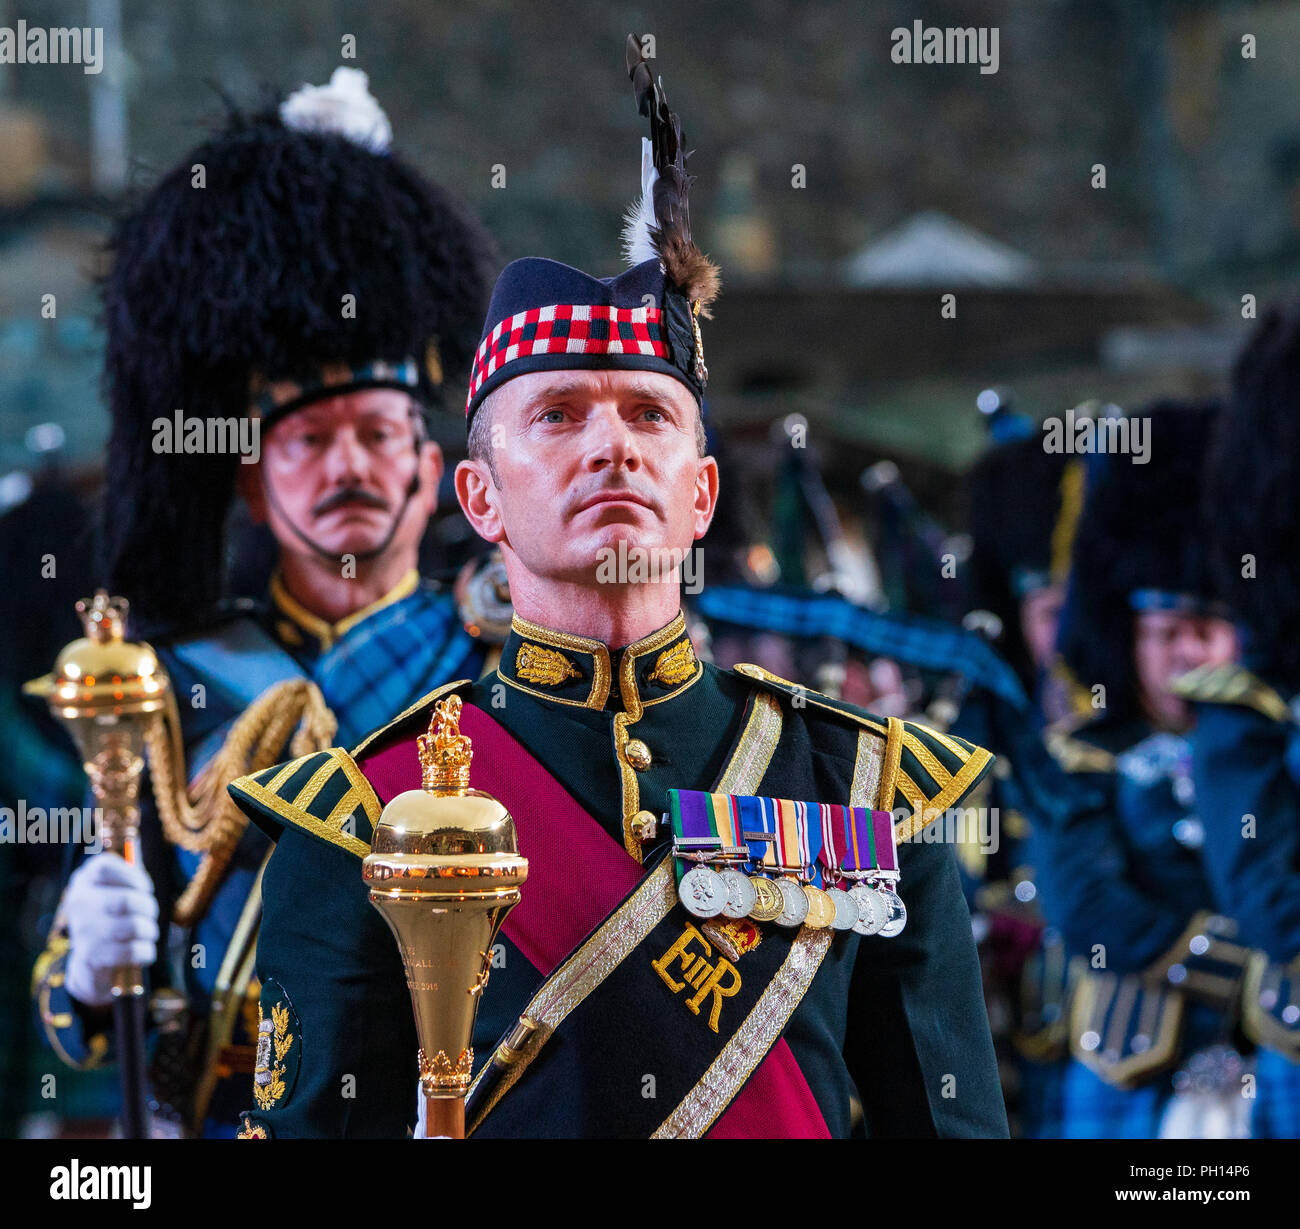 The 2018 Royal Edinburgh International Military Tattoo on esplanade of Edinburgh Castle, Scotland, UK. The Massed Pipes and Drums. - Stock Image